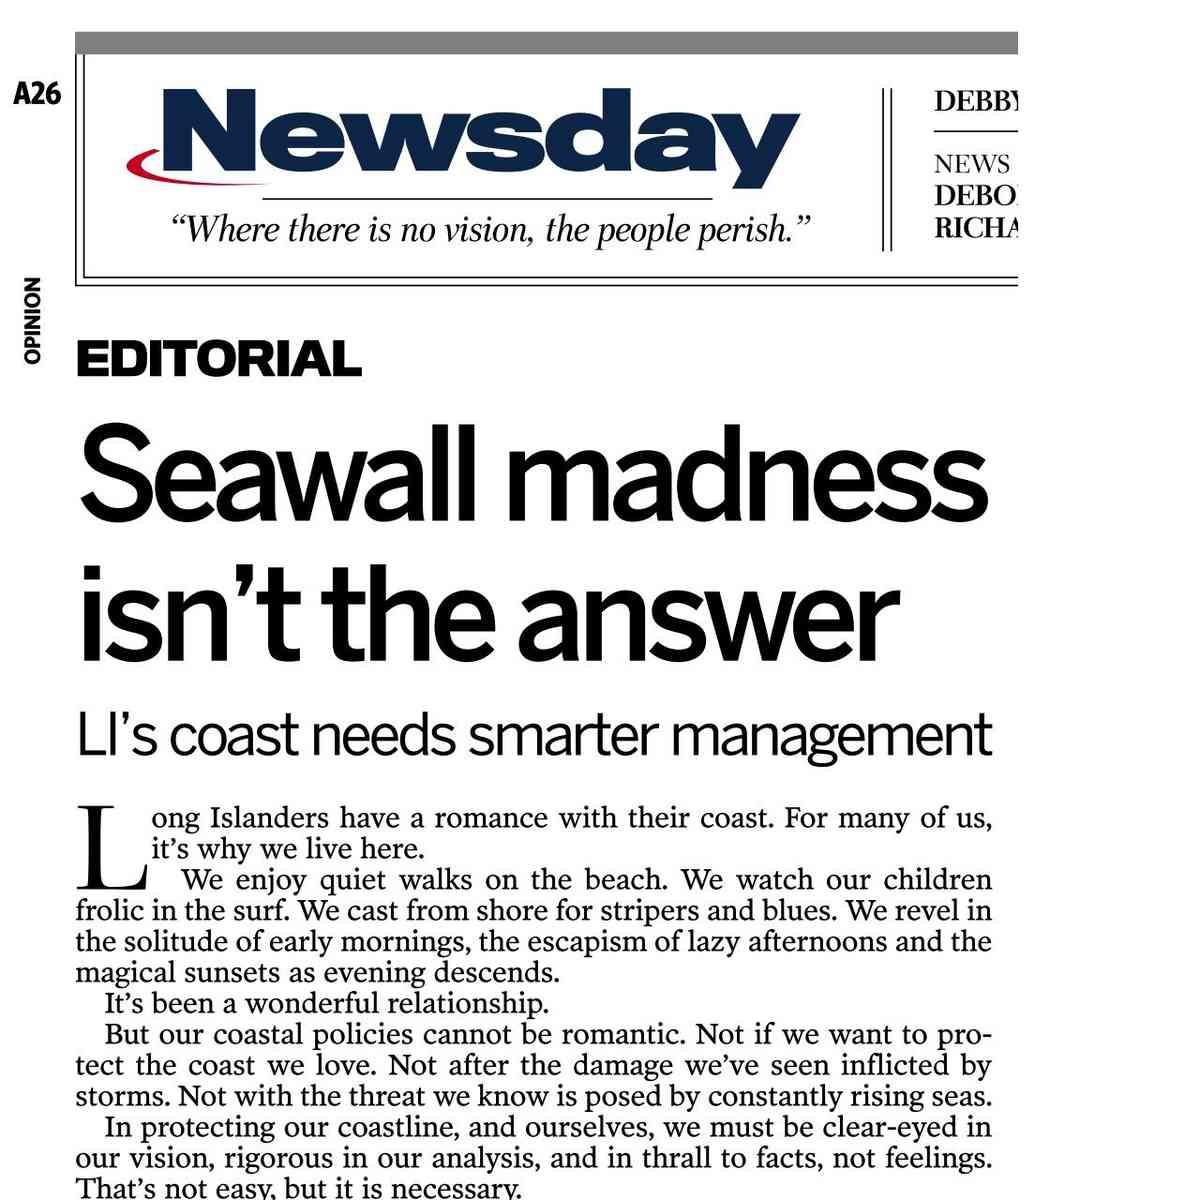 Seawall Madness Isn't the Answer